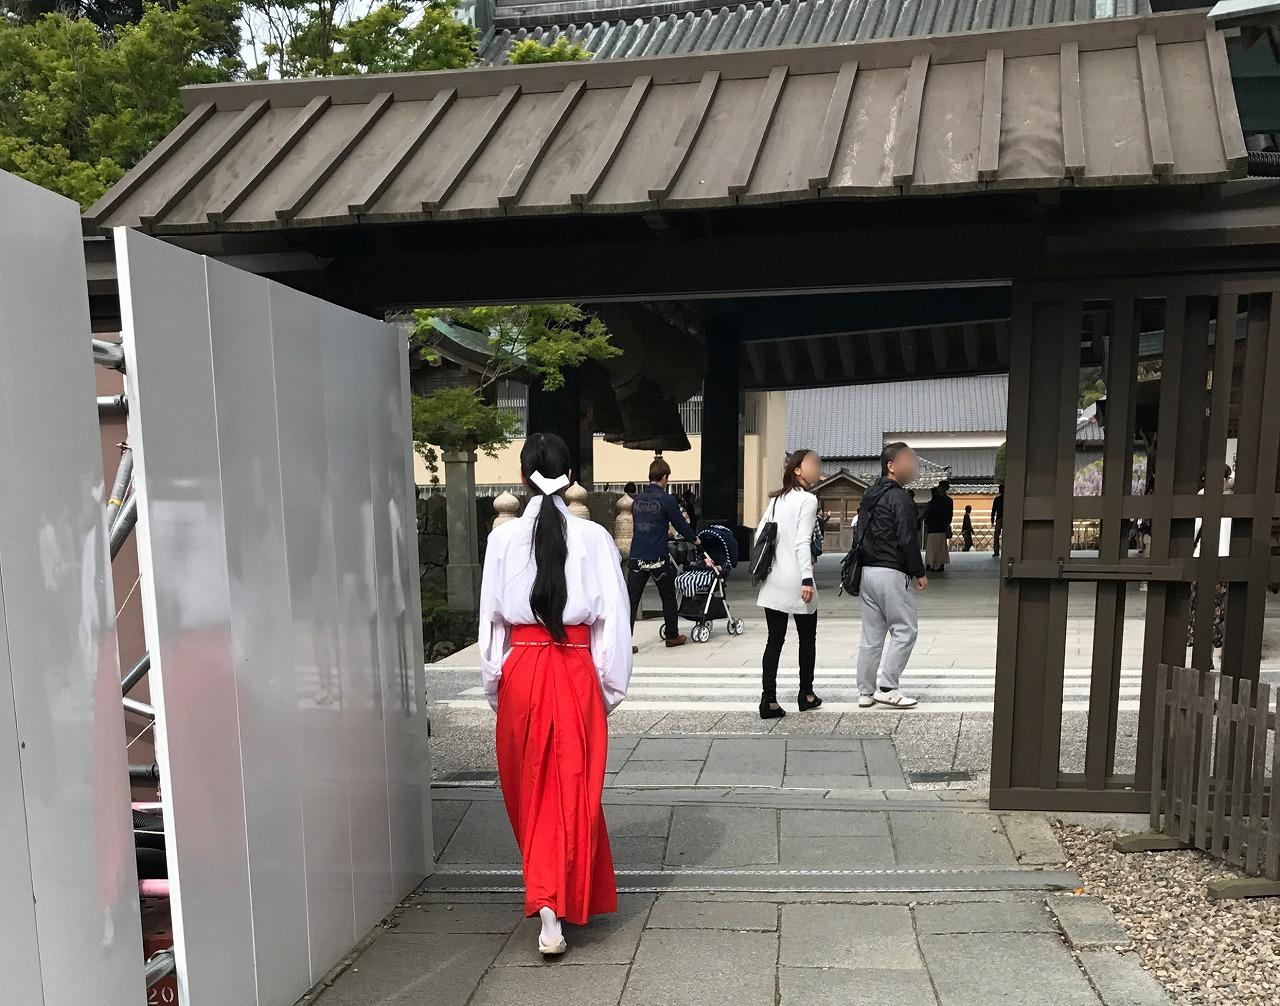 20170503-IzumoTaisha-I15.jpg